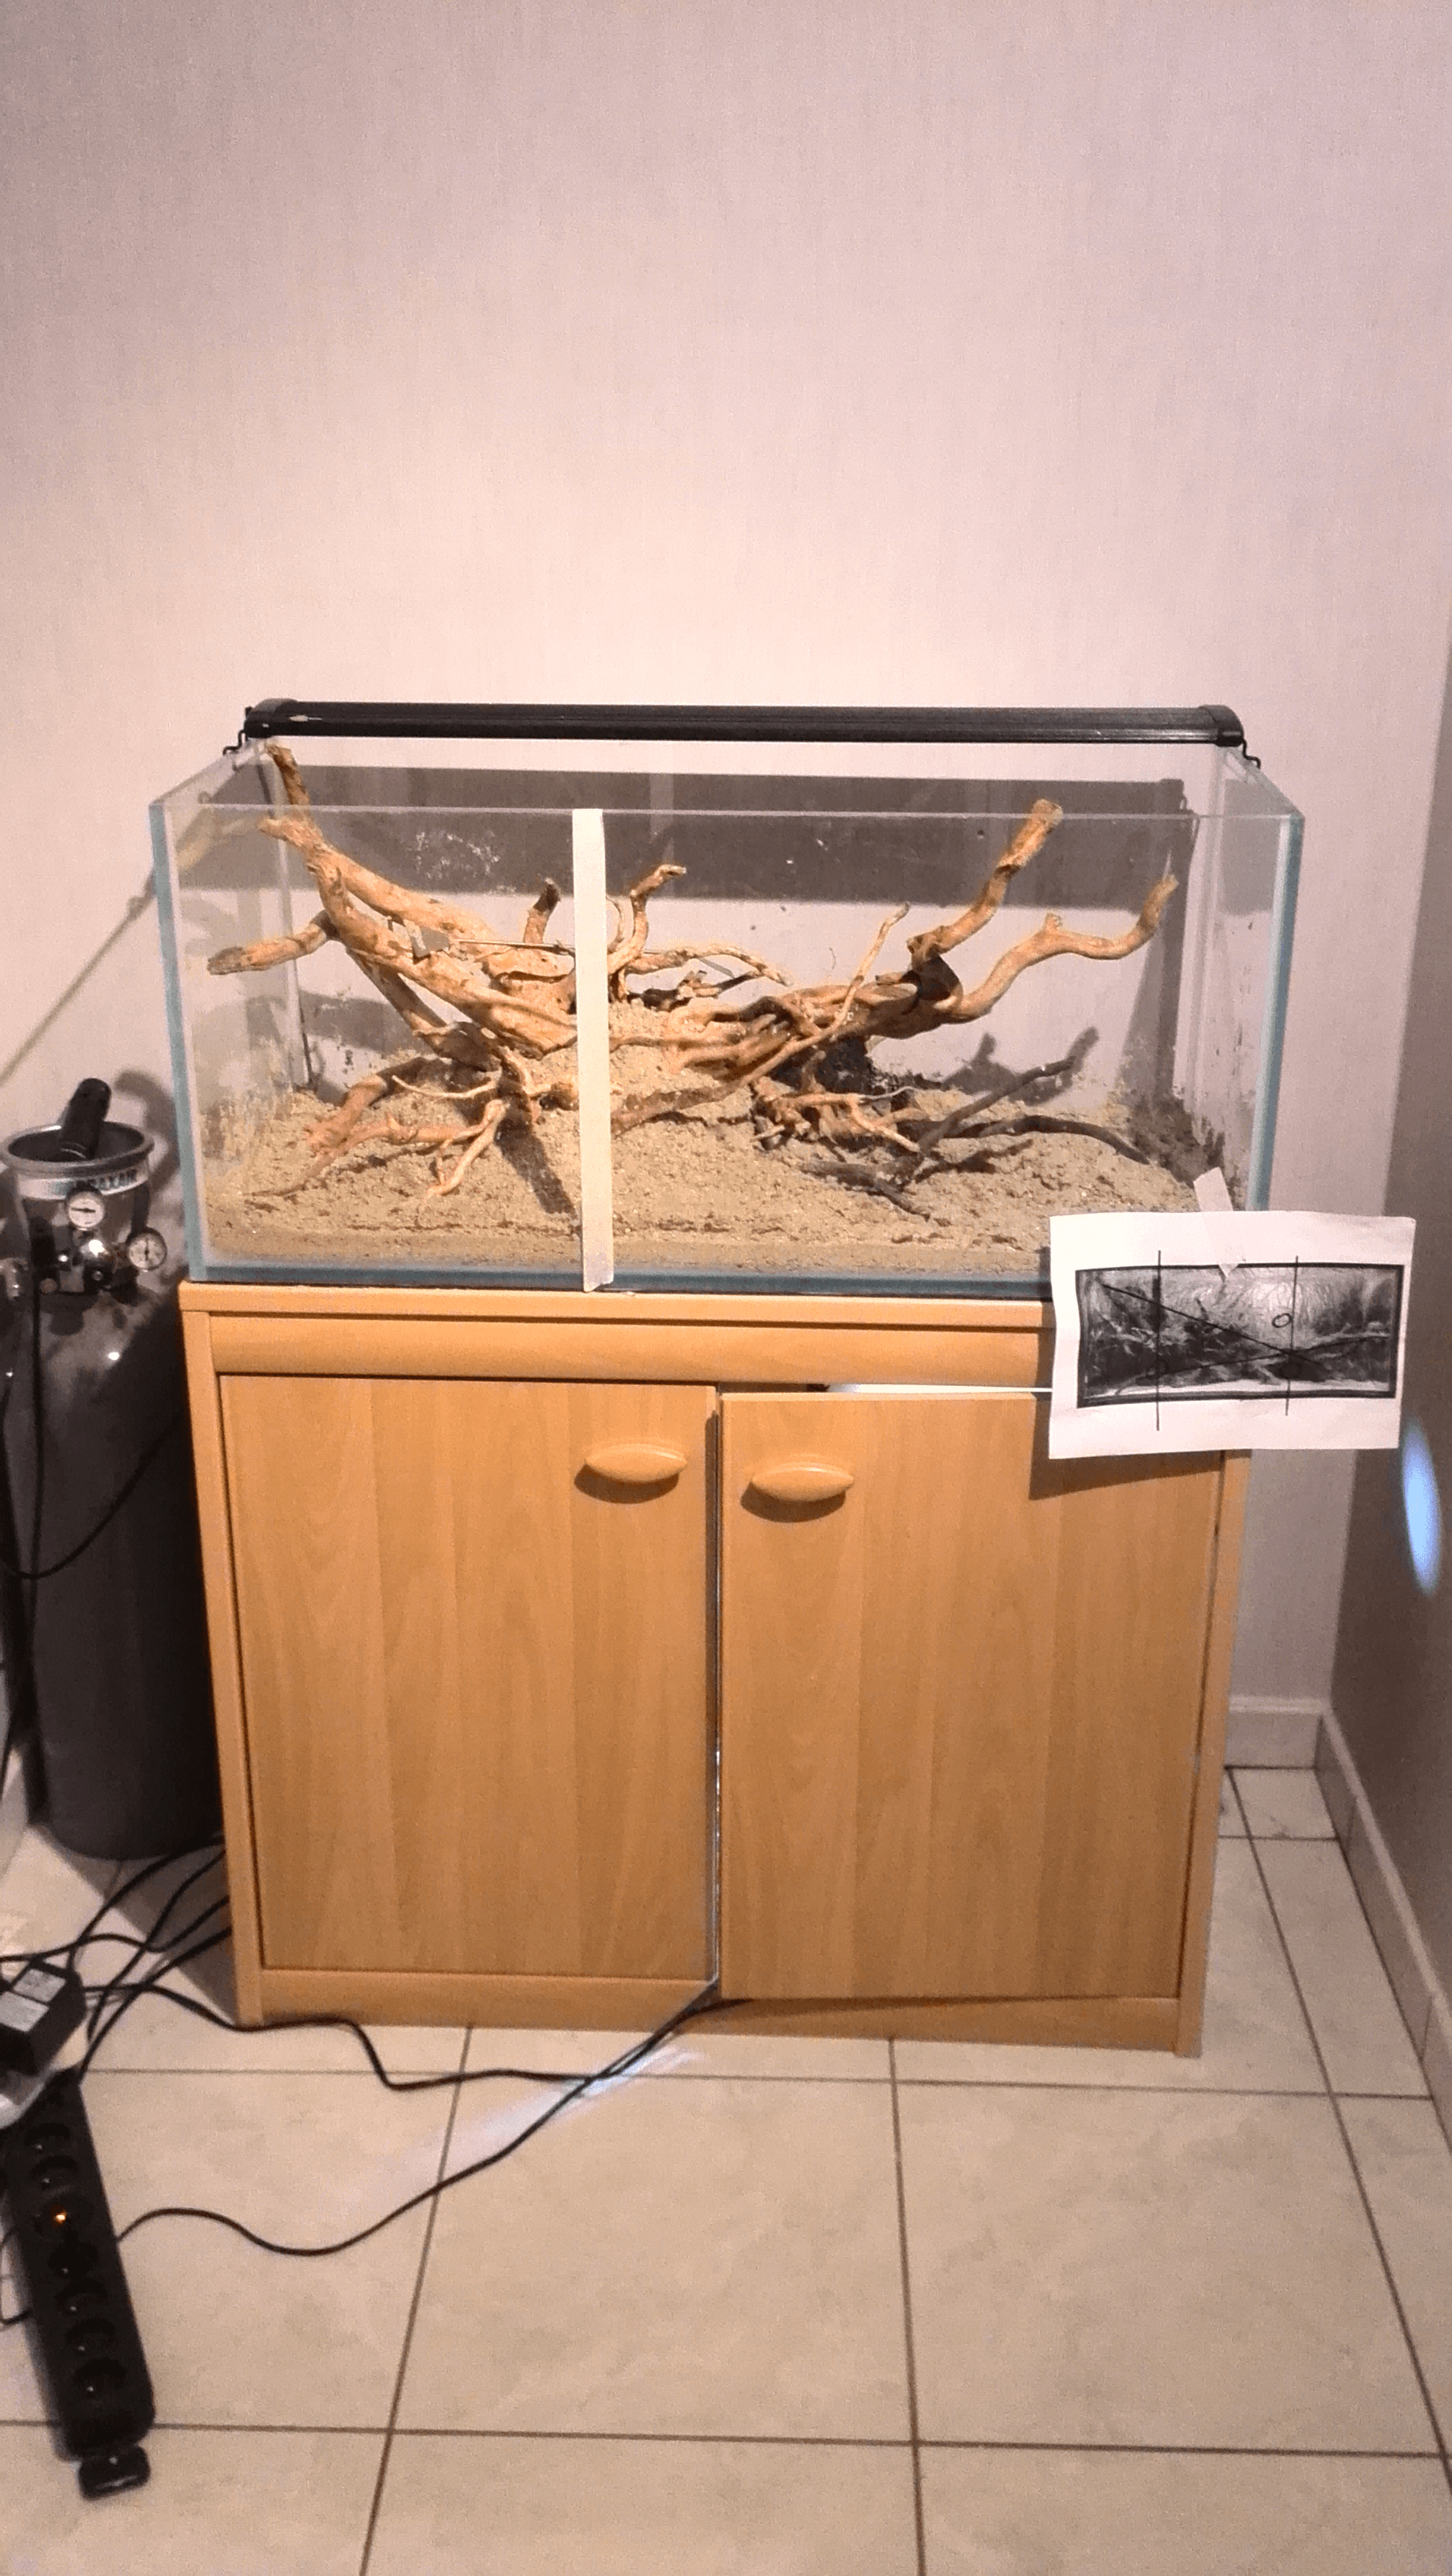 aquarium gulden snede